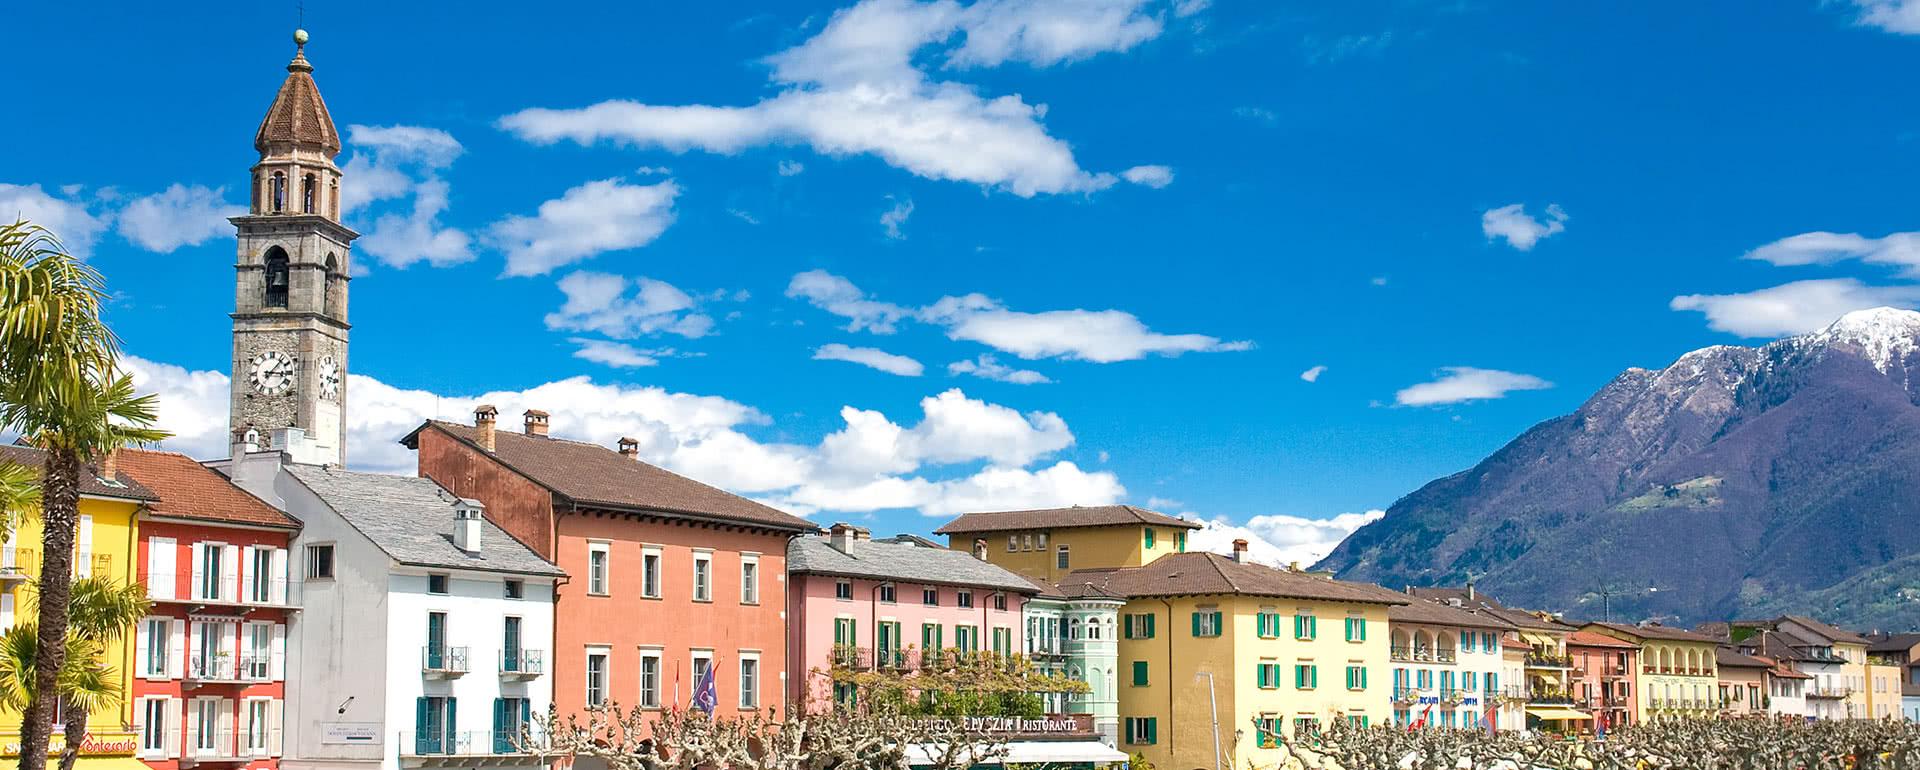 Titelbild von Ascona